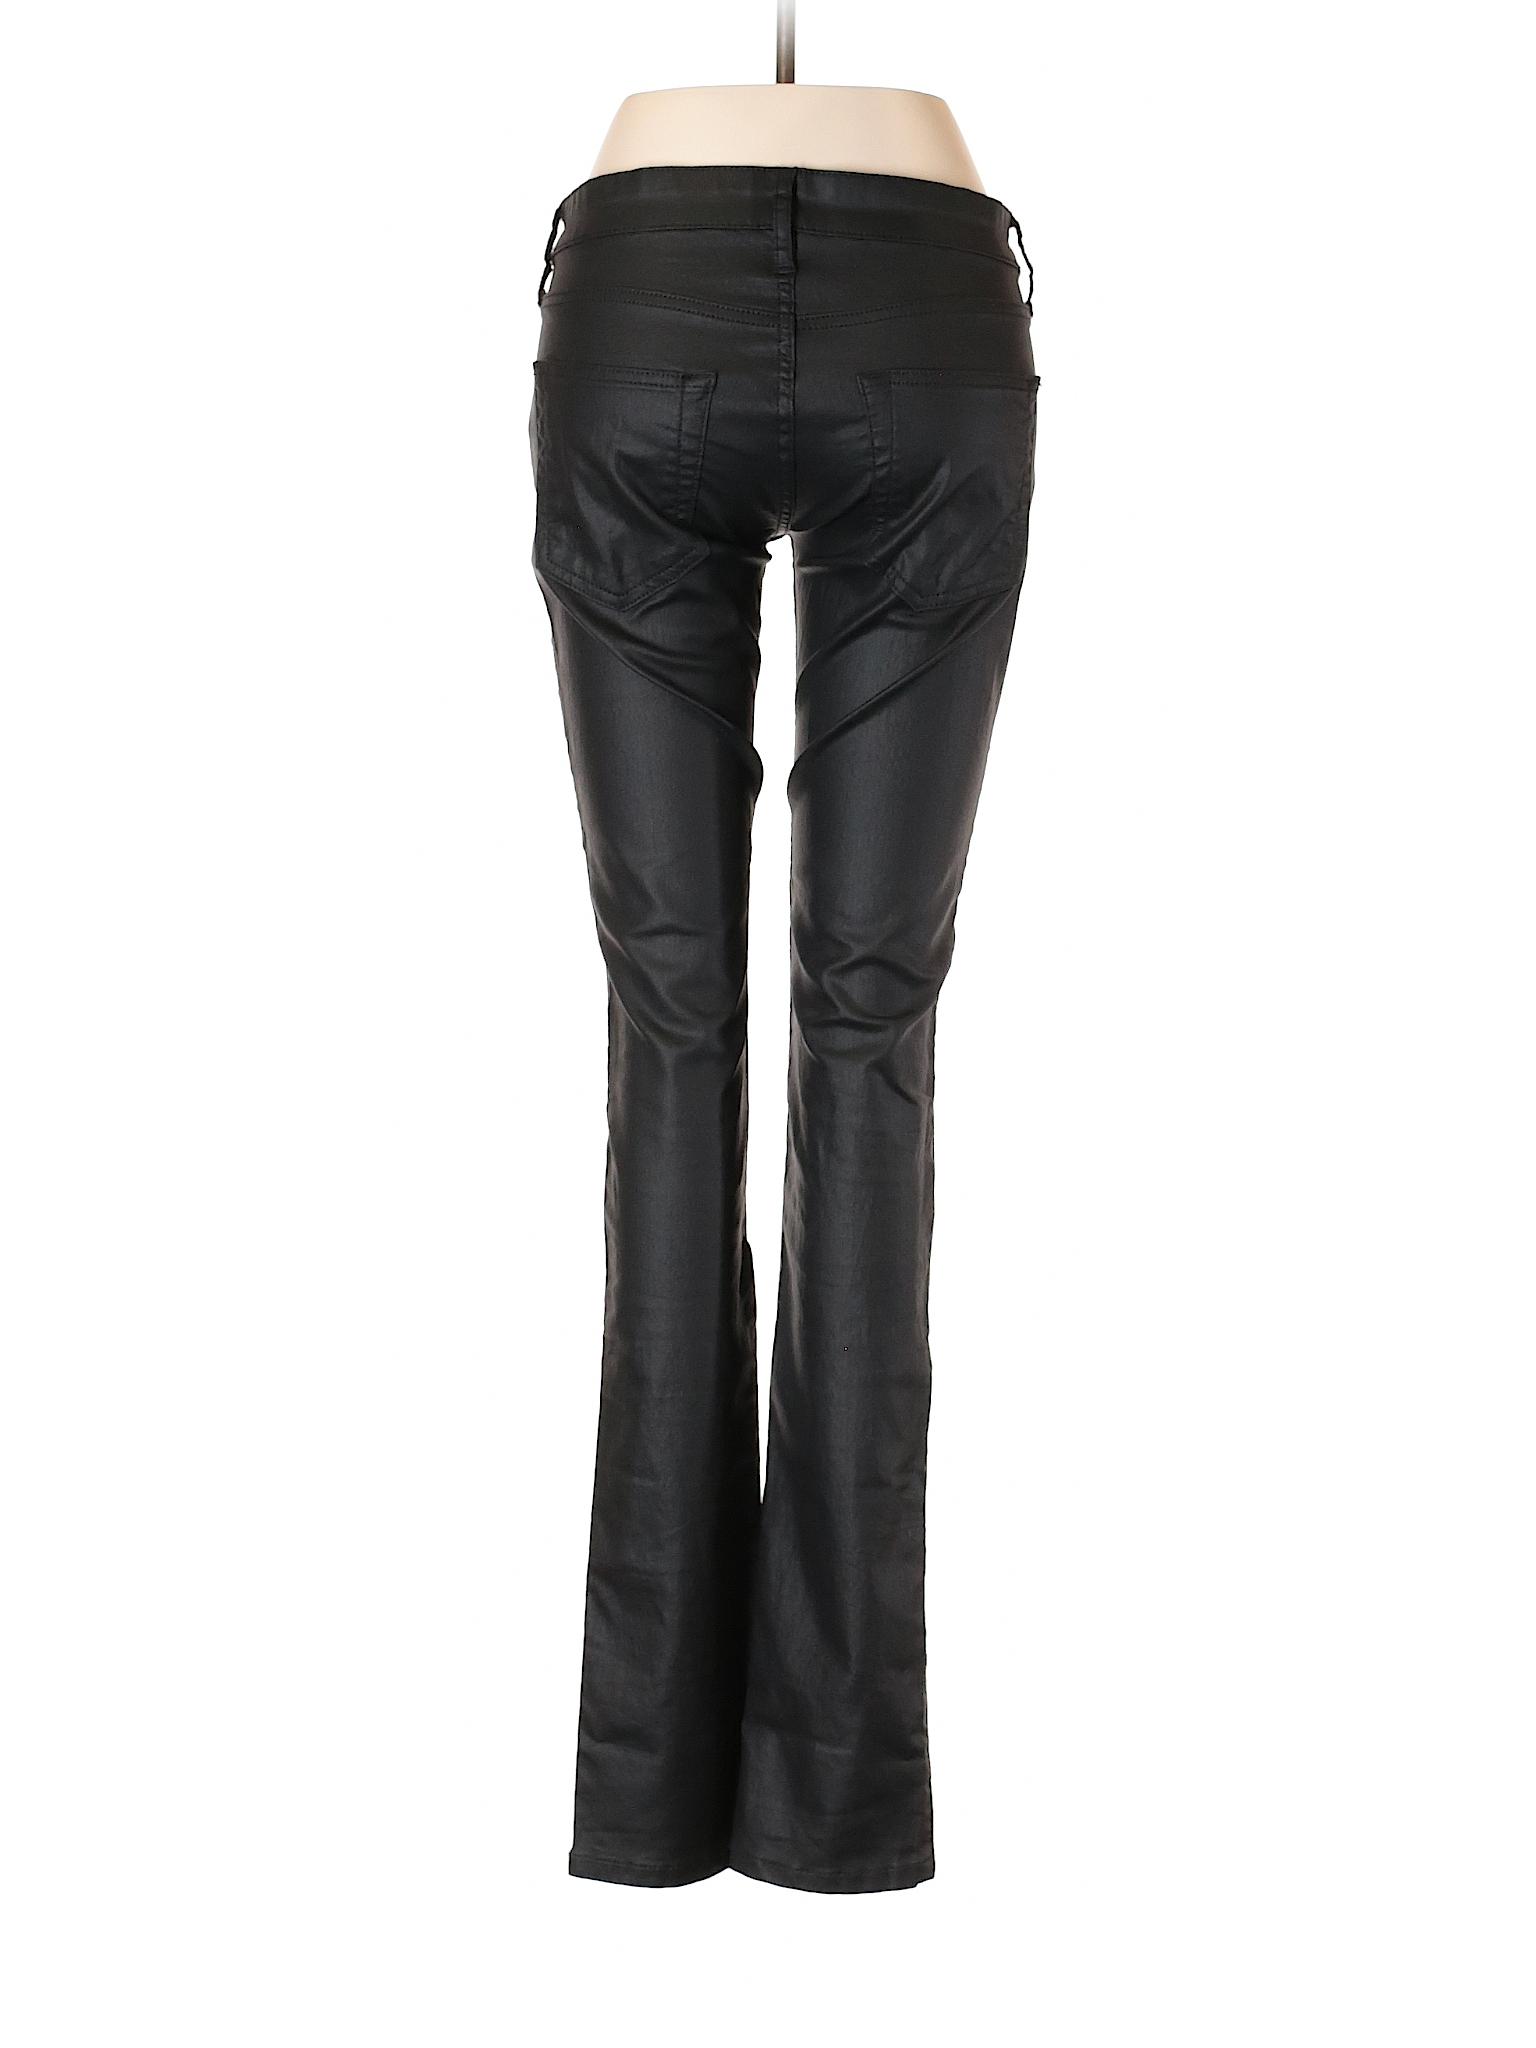 Caro Fc by Promotion Jeans Fenney w6I8Bw4q